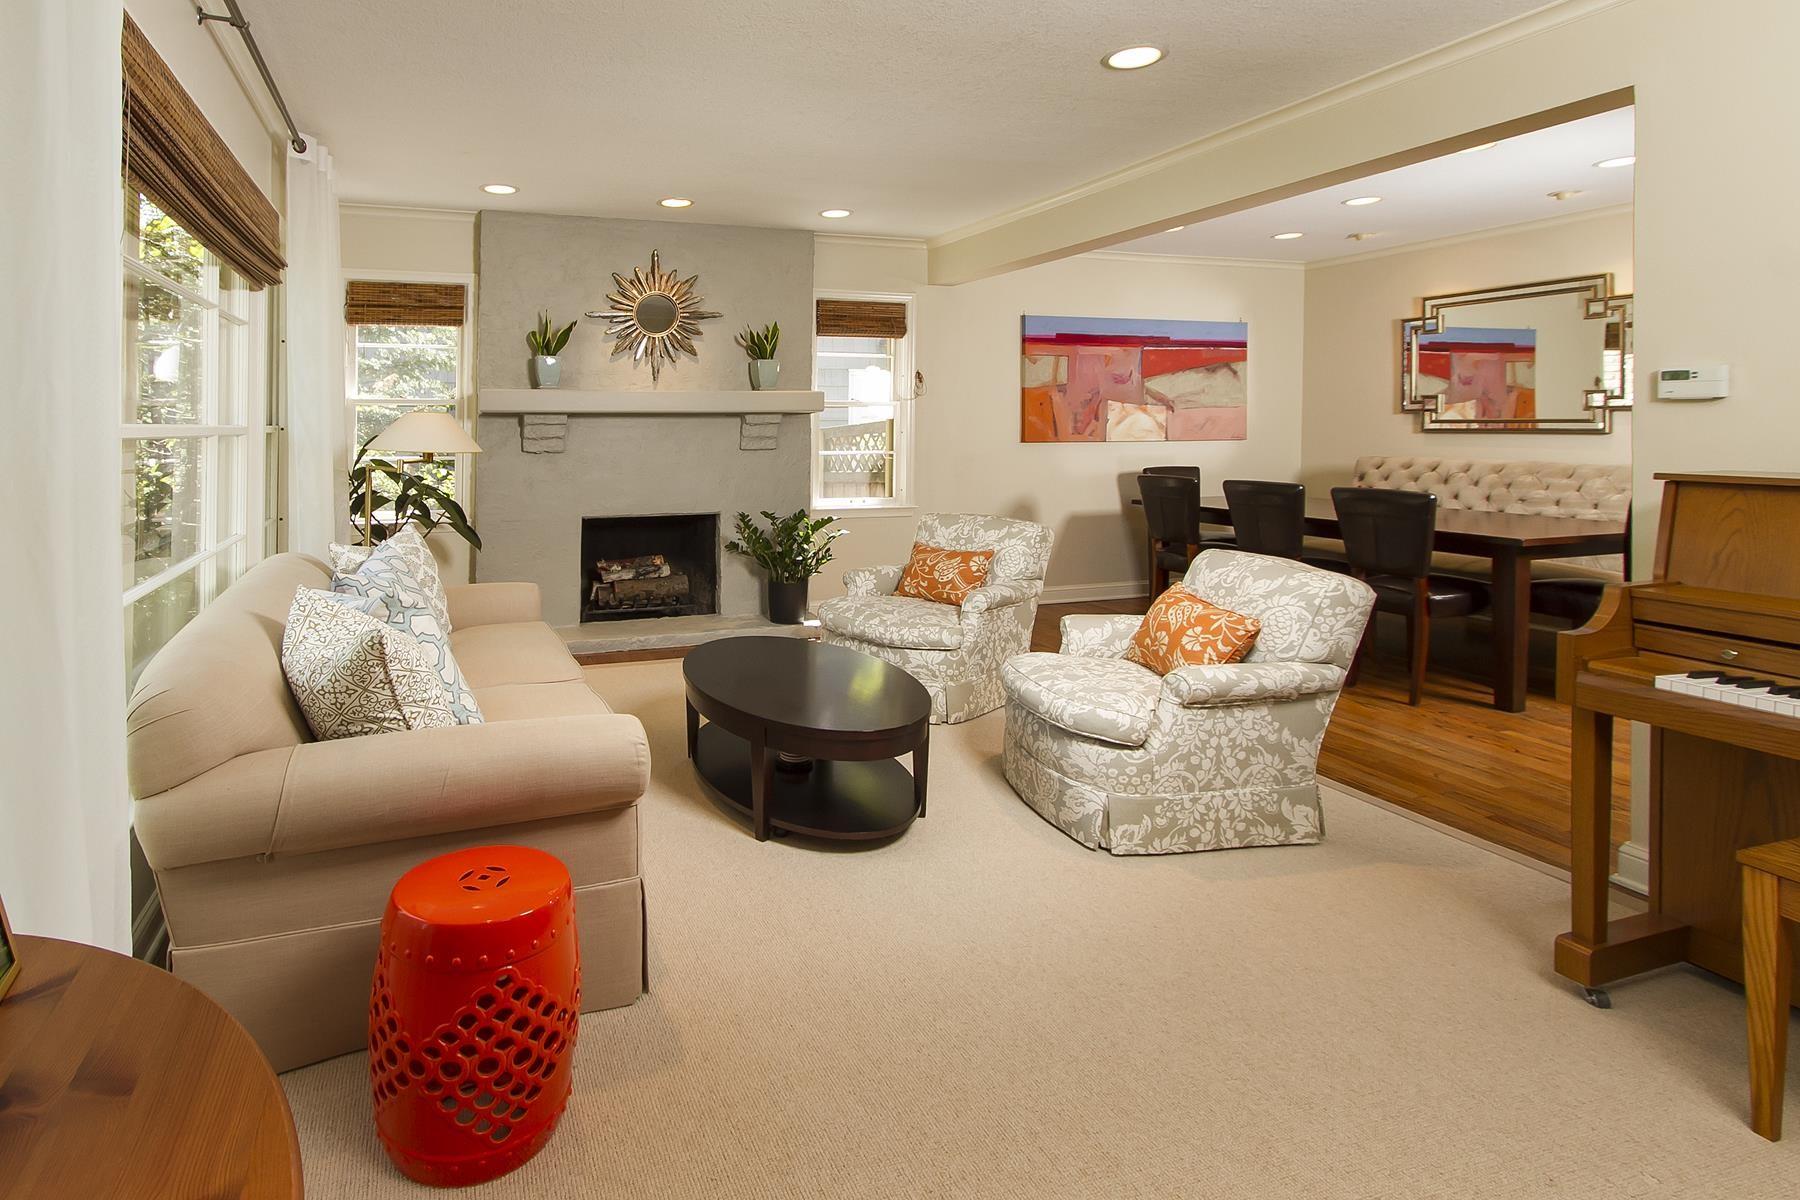 5404 Kellogg Ave Minneapolis Mn 55424 4 Bedroom Apartment For Rent Padmapper